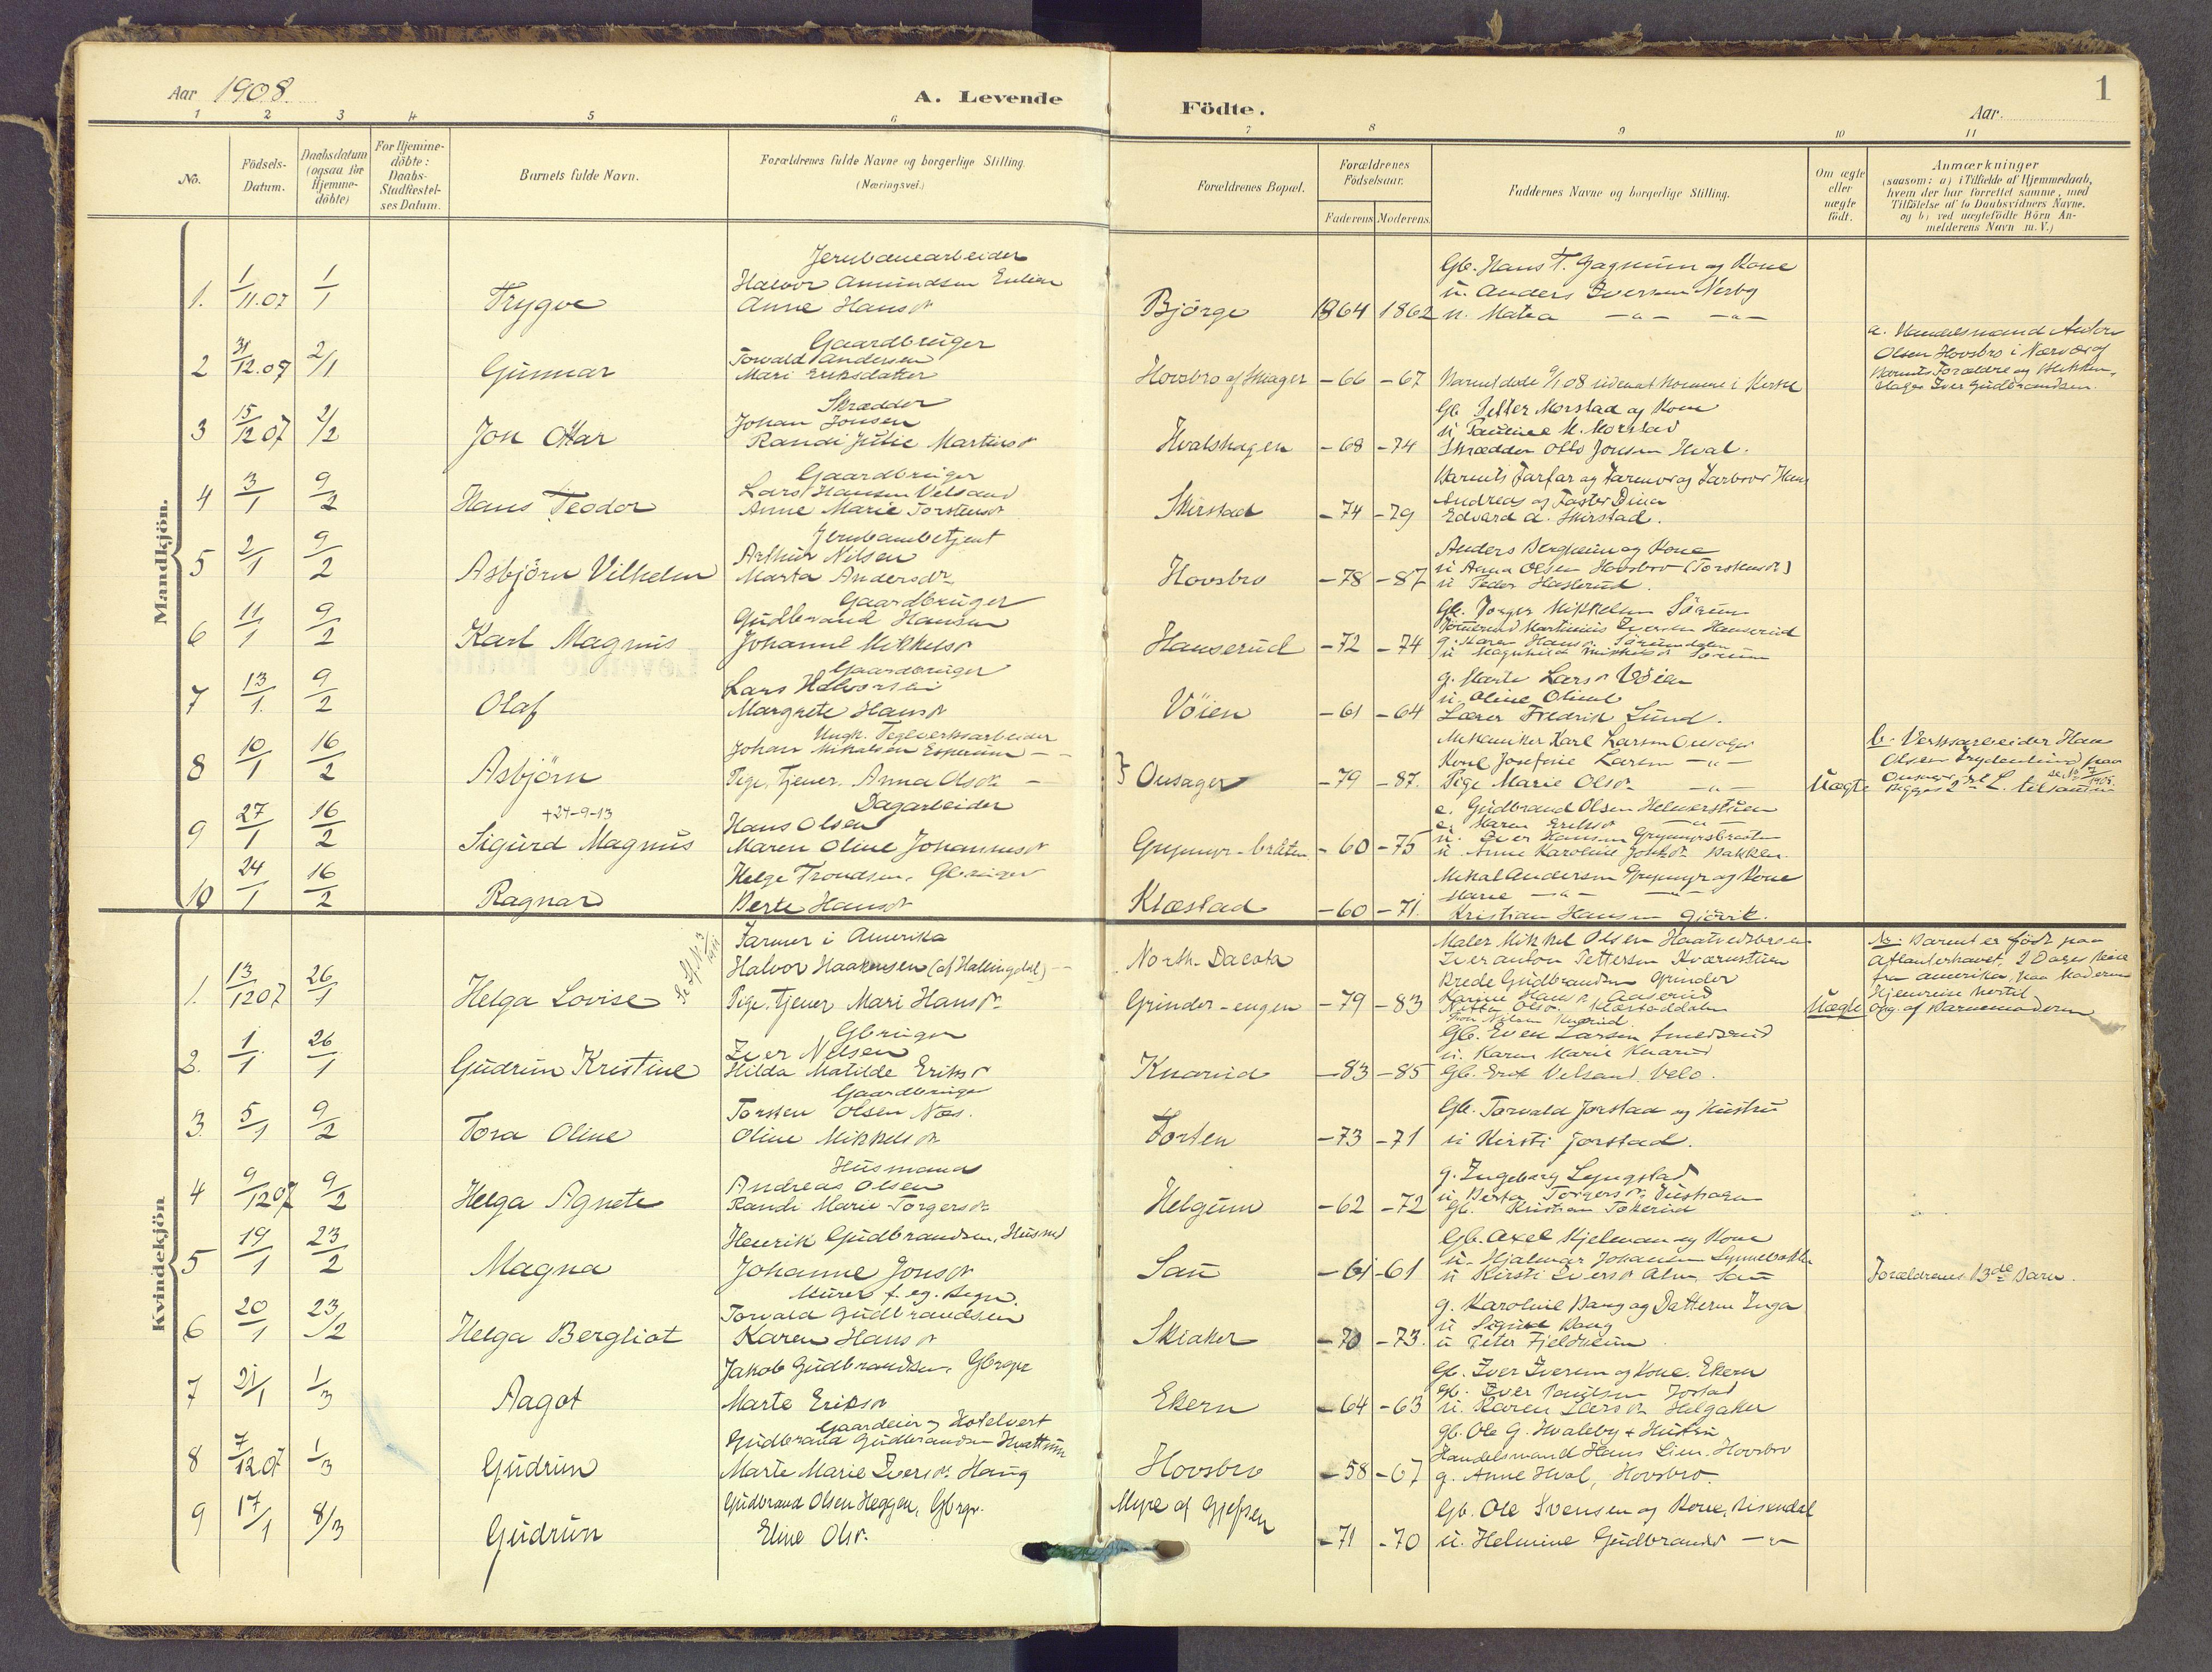 SAH, Gran prestekontor, Ministerialbok nr. 21, 1908-1932, s. 1